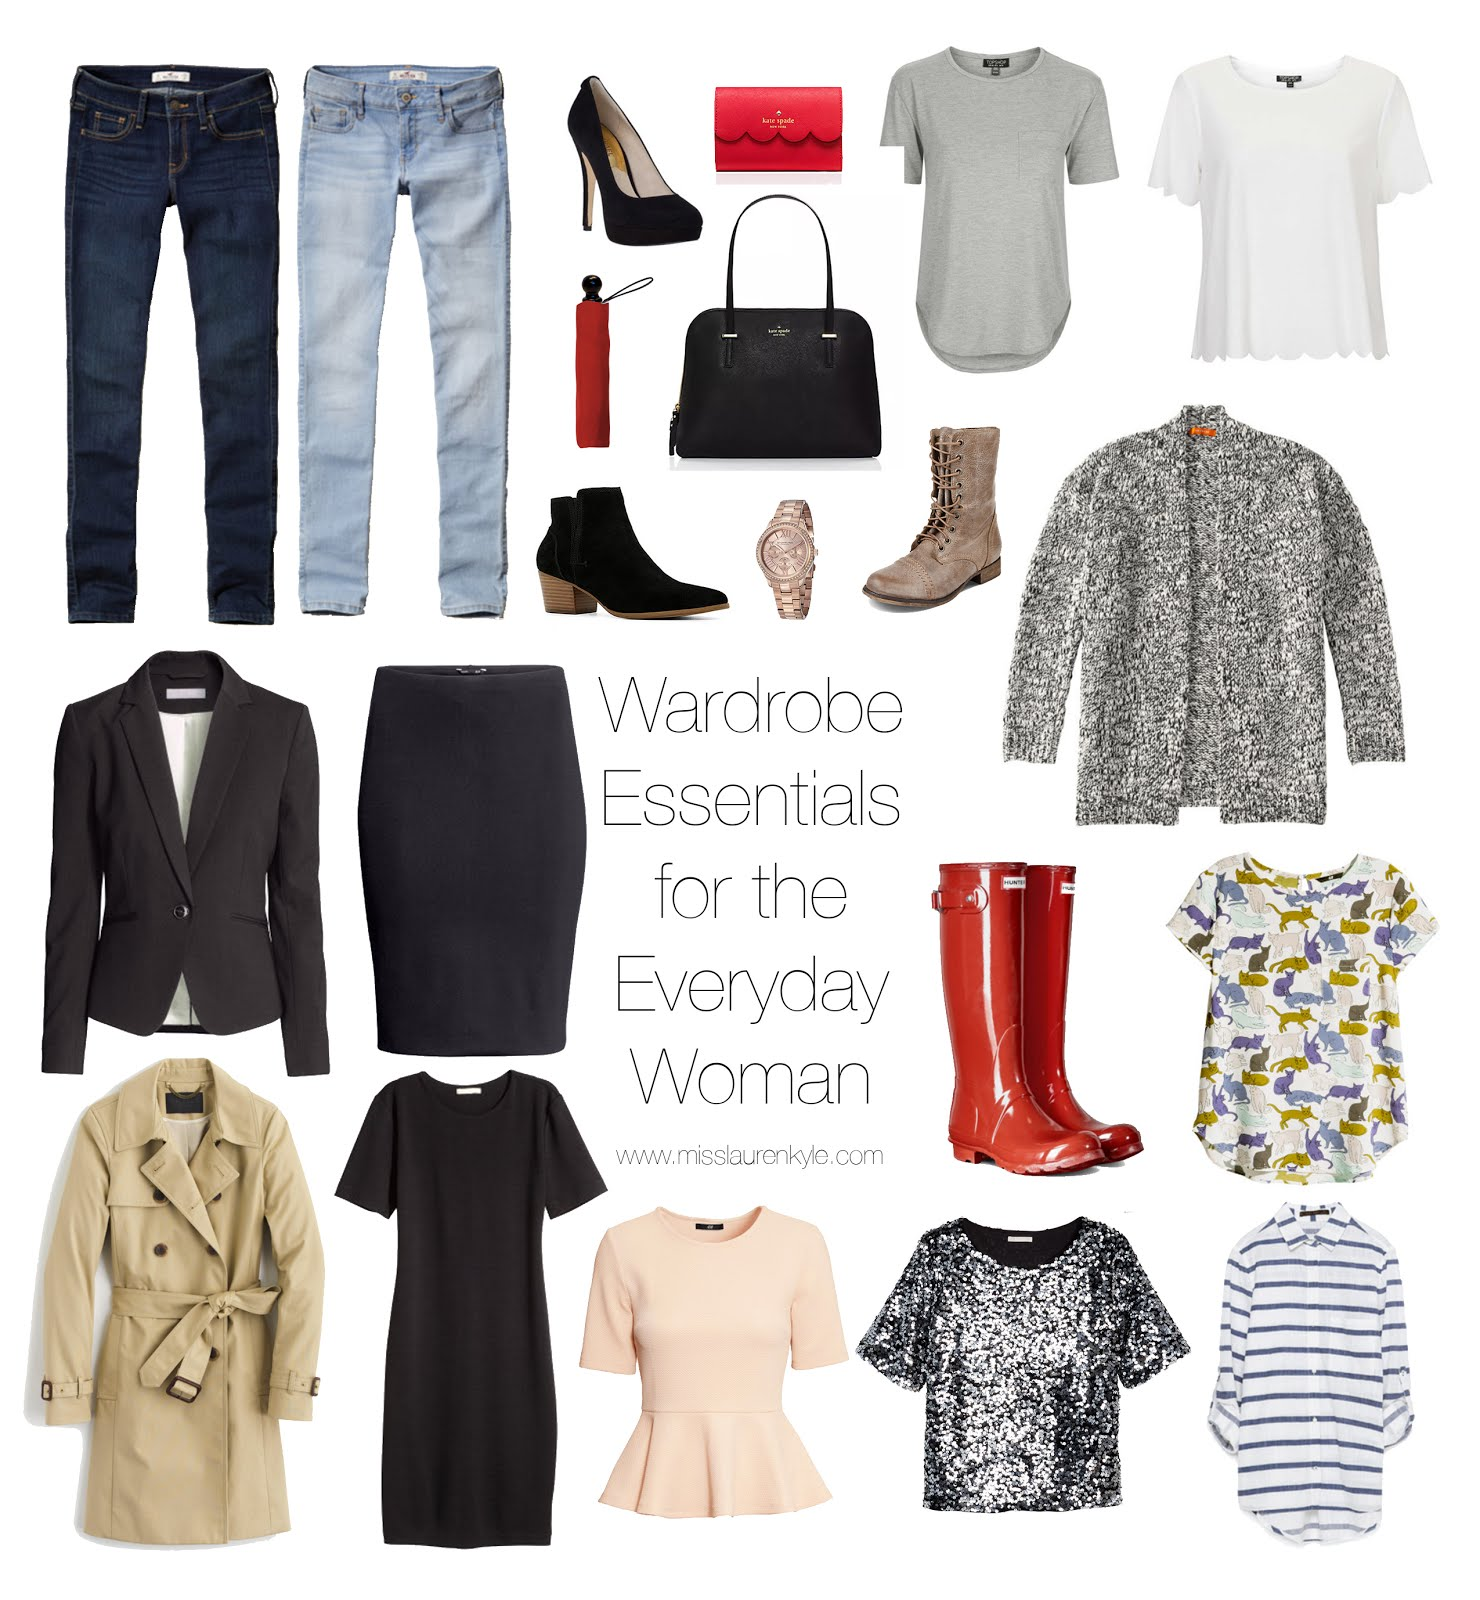 Wardrobe Essentials for the Everyday Woman Miss Lauren Kyle